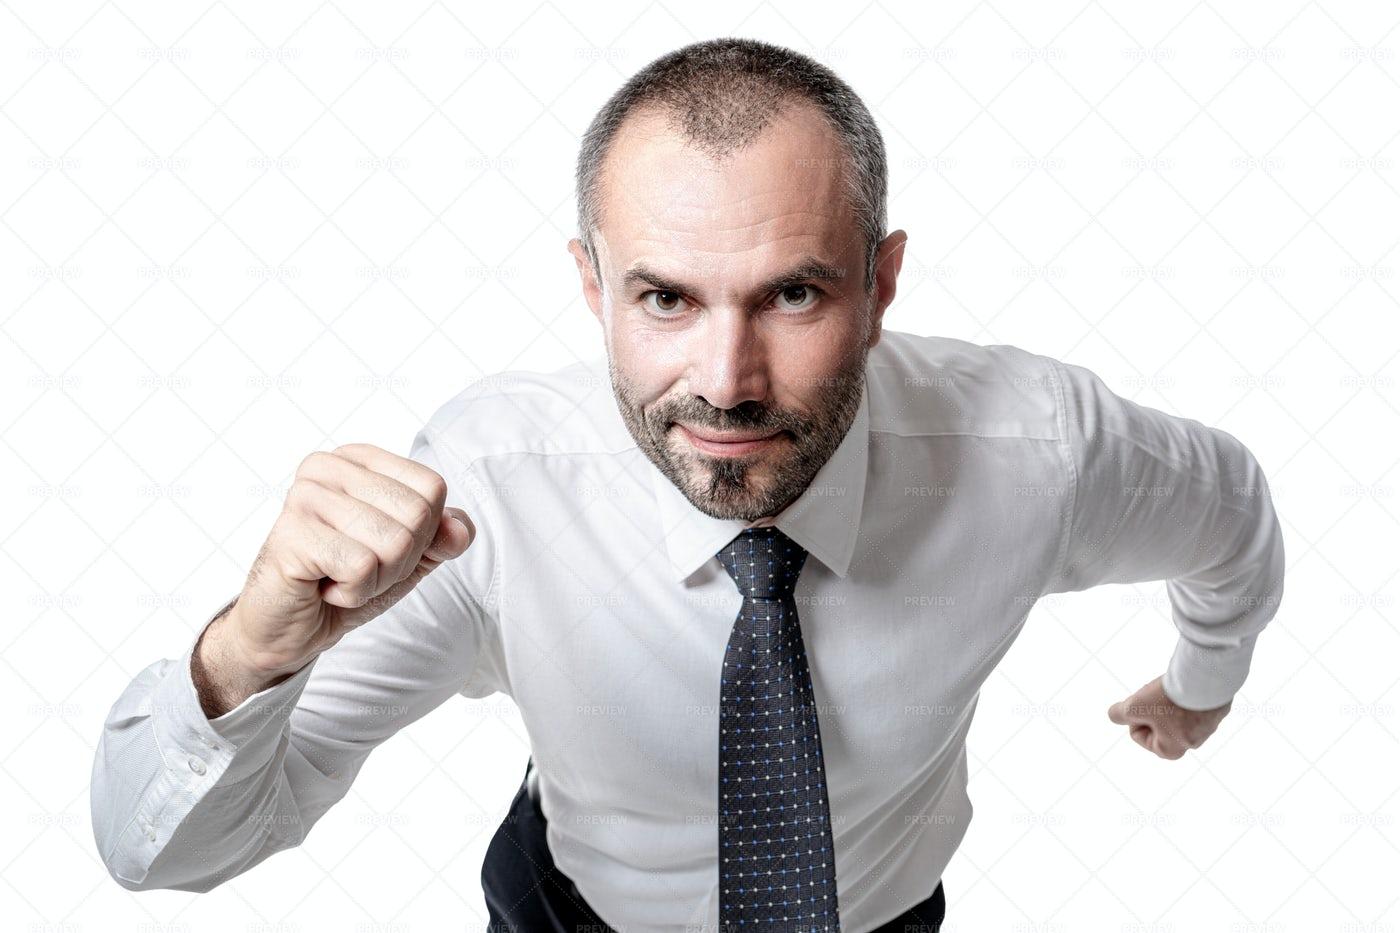 Running Businessman: Stock Photos